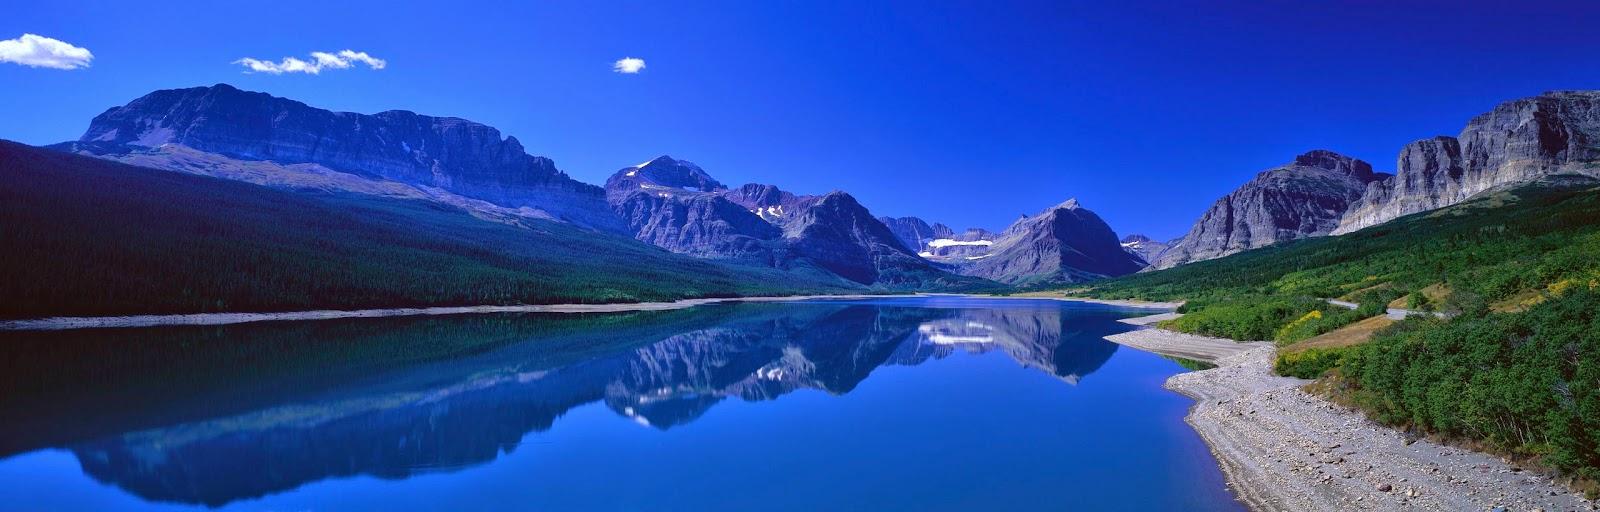 Lake squeezed mountains free hd desktop wallpaper